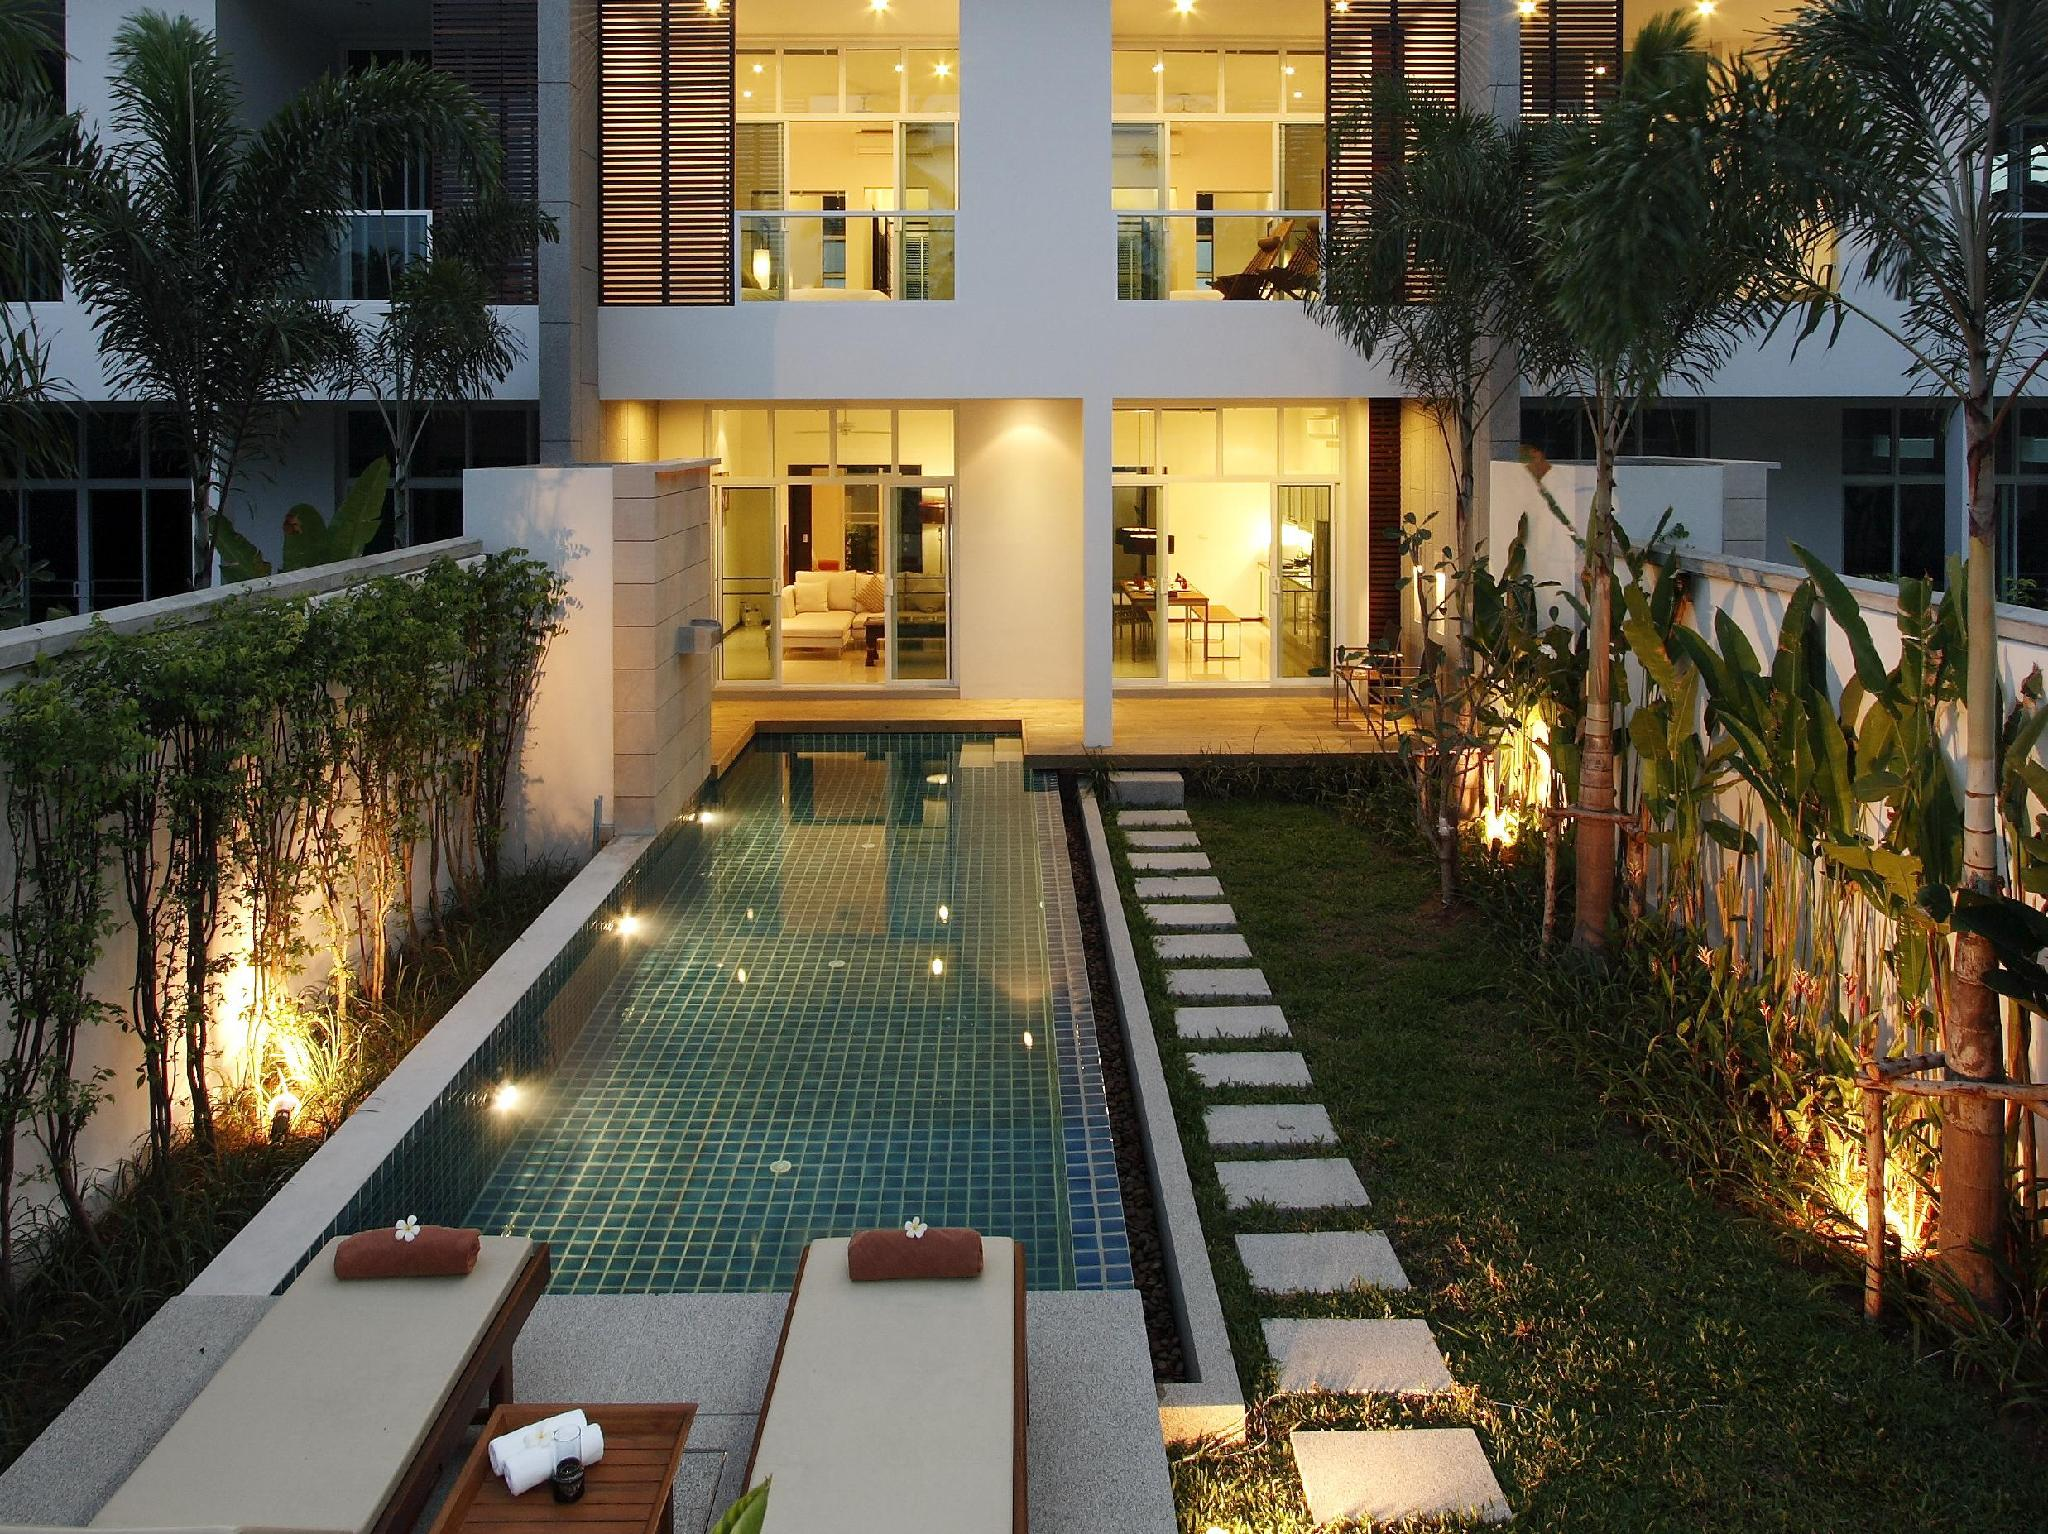 Two Villas Holiday Phuket: Oxygen Style Nai Harn Beach